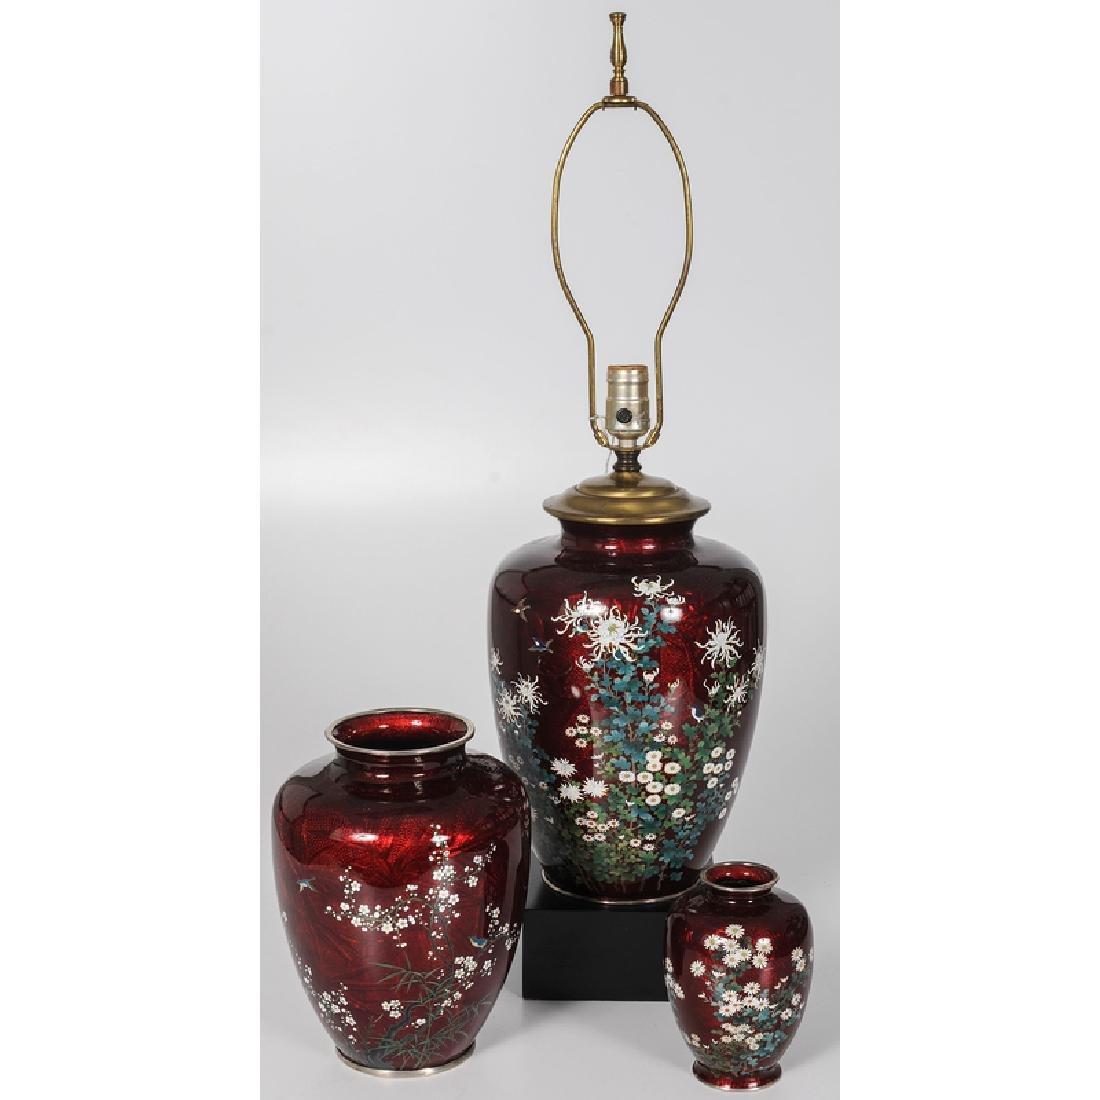 Japanese Guilloché Enamel Vases and Lamp